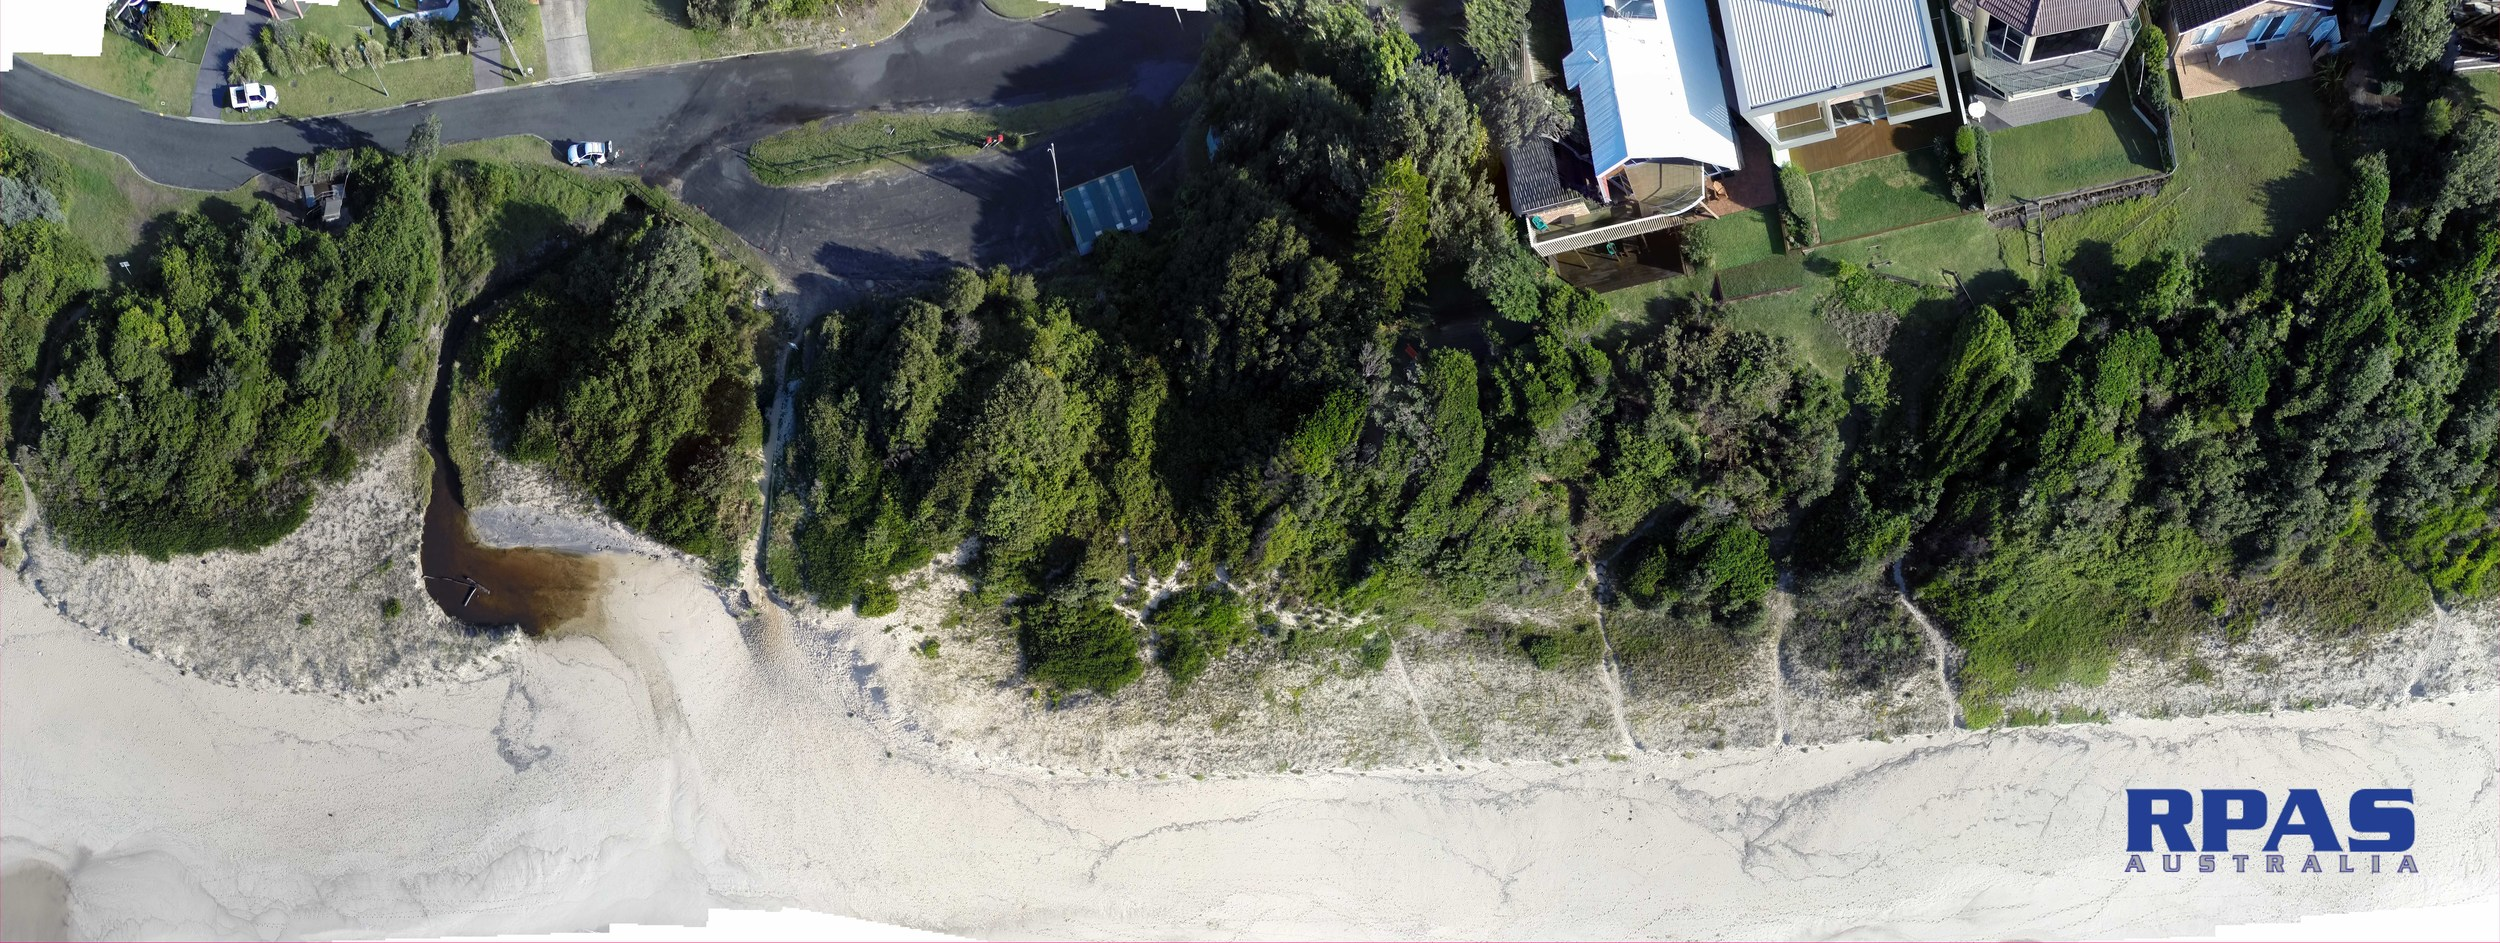 Coastal Zone management Plan CZMP